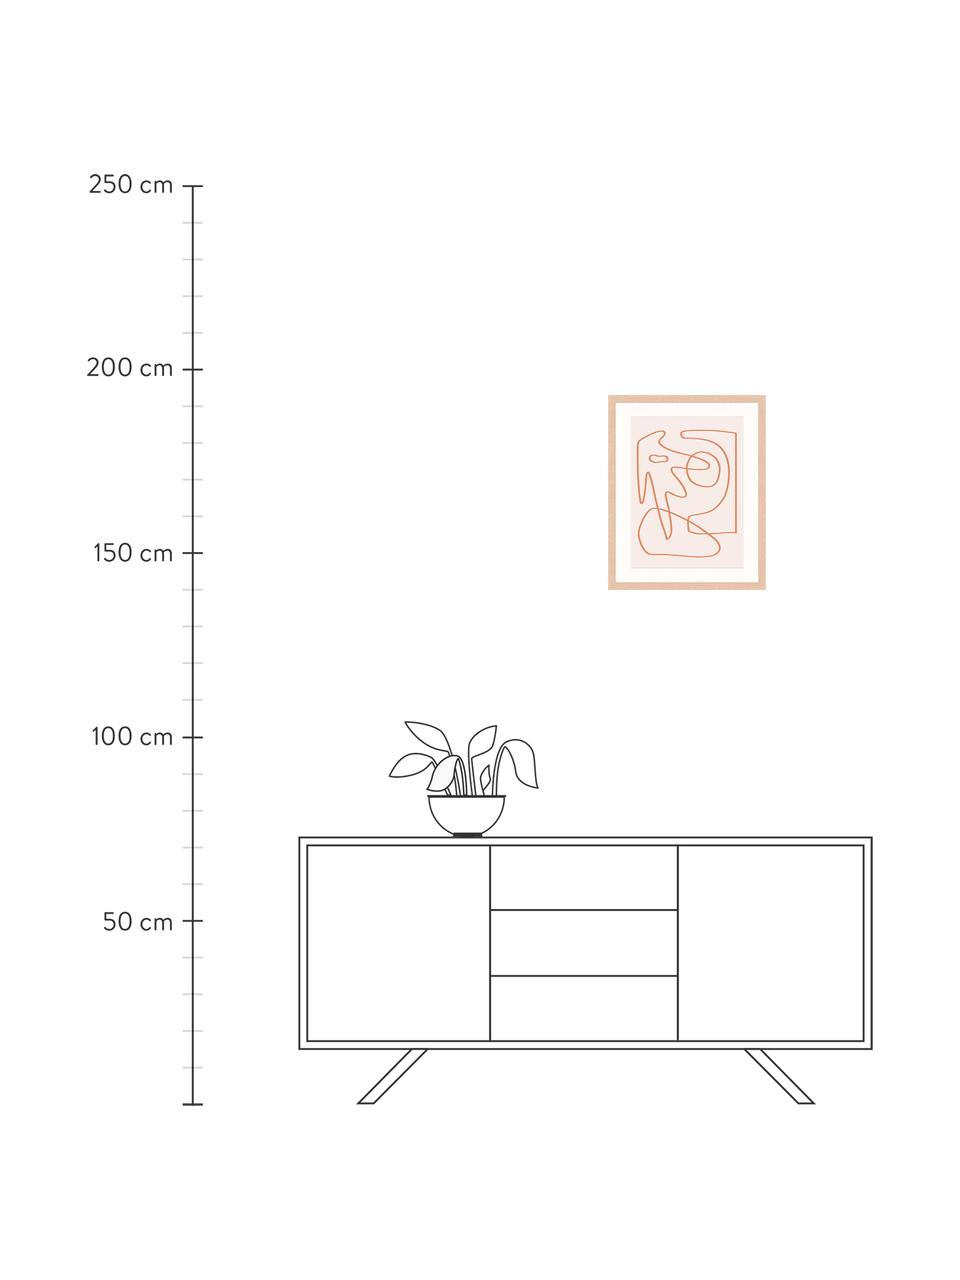 Gerahmter Digitaldruck Abstract Organic Drawing, Bild: Digitaldruck auf Papier, , Rahmen: Holz, lackiert, Front: Plexiglas, Rosa, Orange, 43 x 53 cm